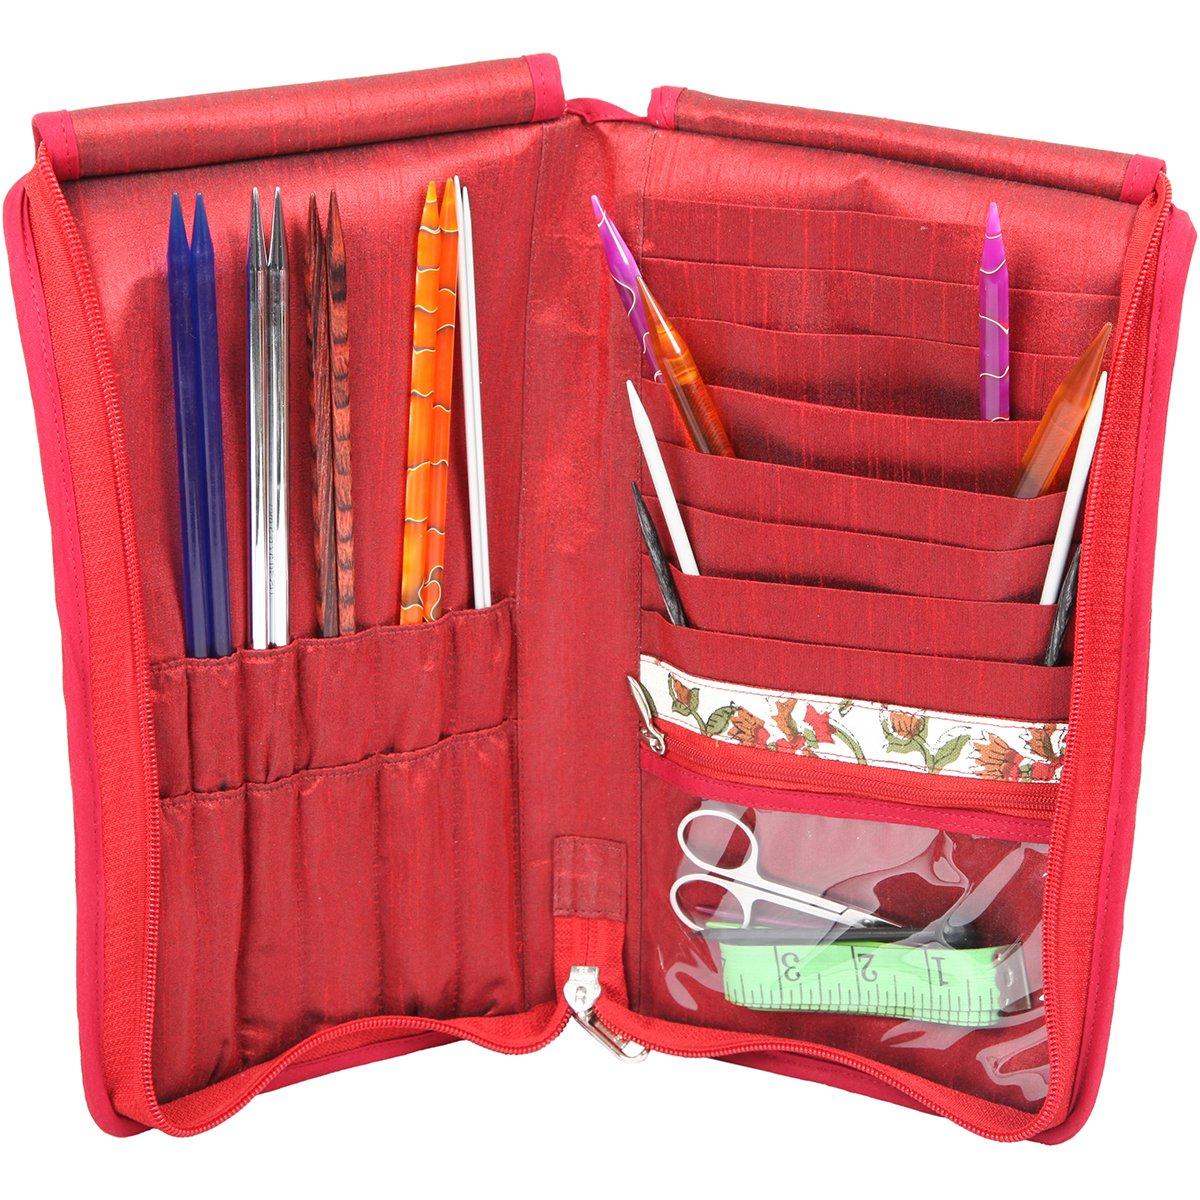 Knitter's Pride 810003 Aspire Assorted Needles Case